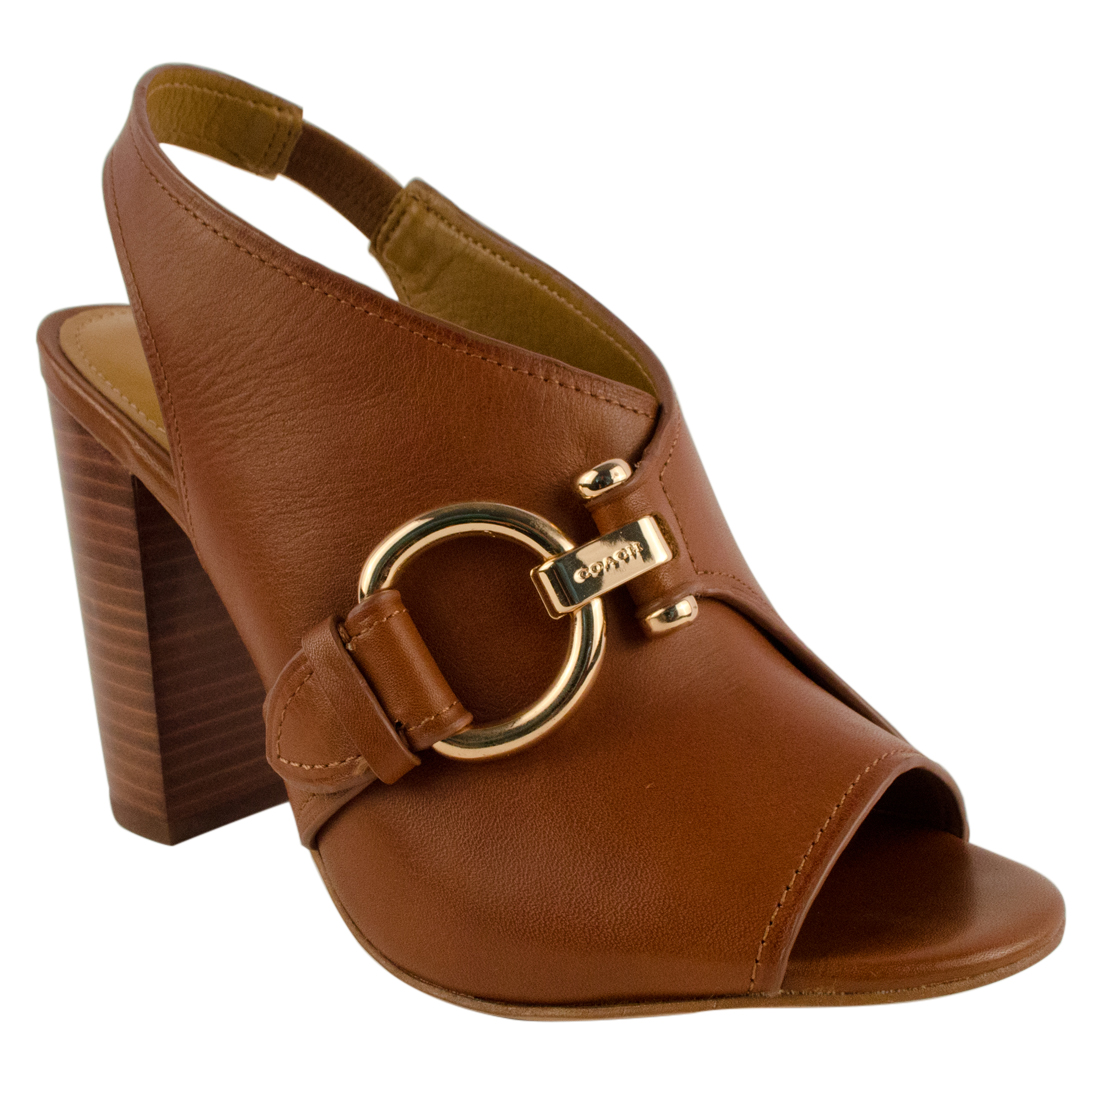 COACH Women's Sherry Peep Toe Sling Back Dress Sandals | eBay